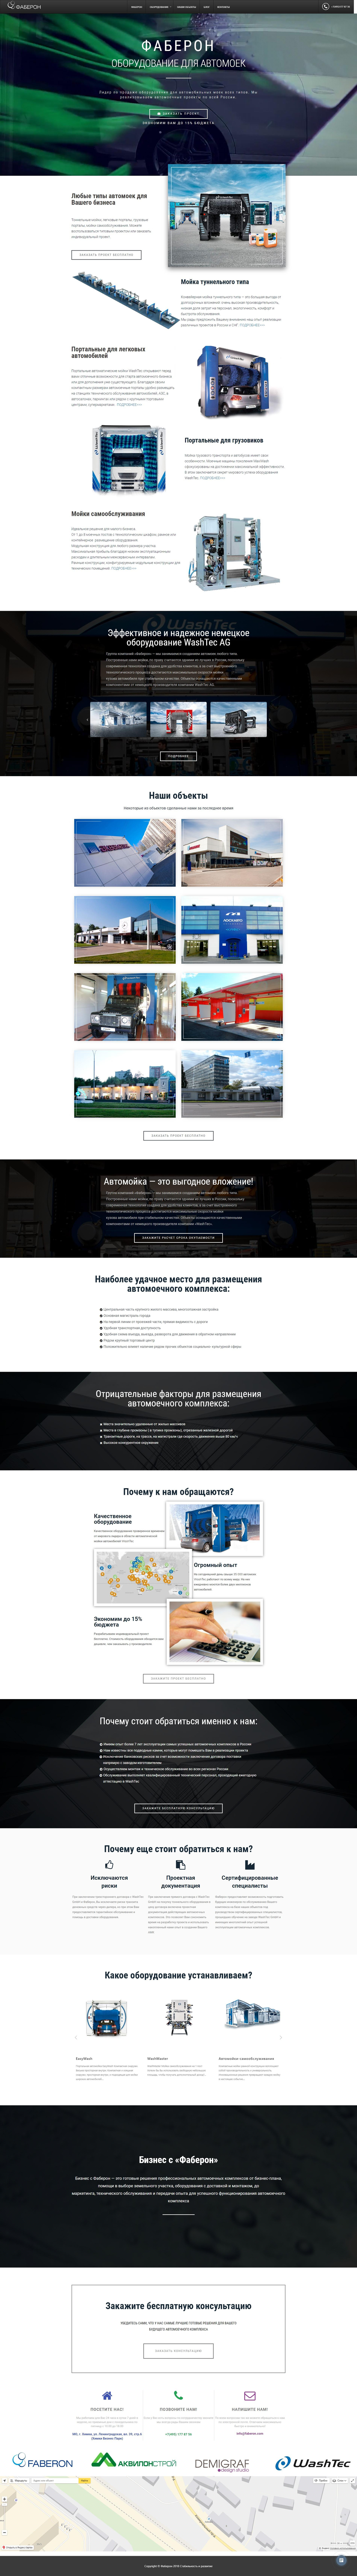 screencapture-faberon-2018-06-24-11_17_29